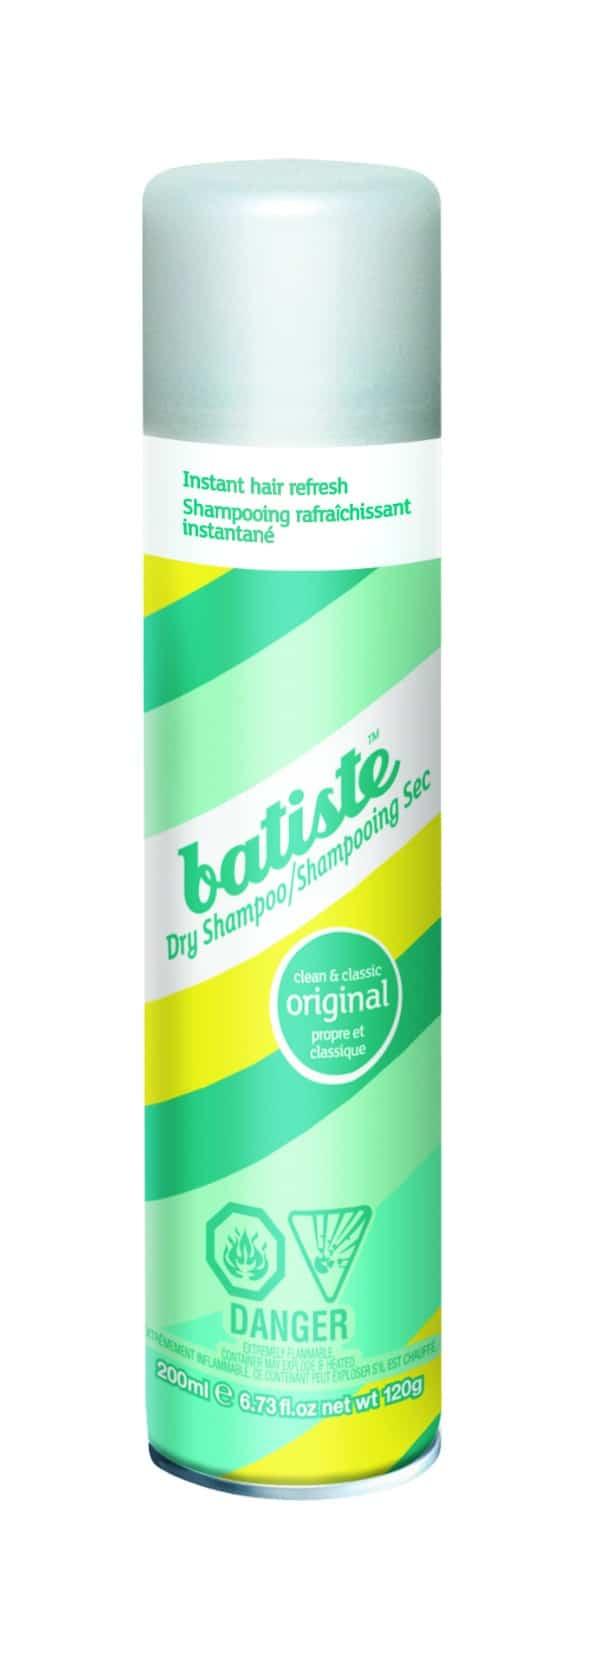 batiste-2